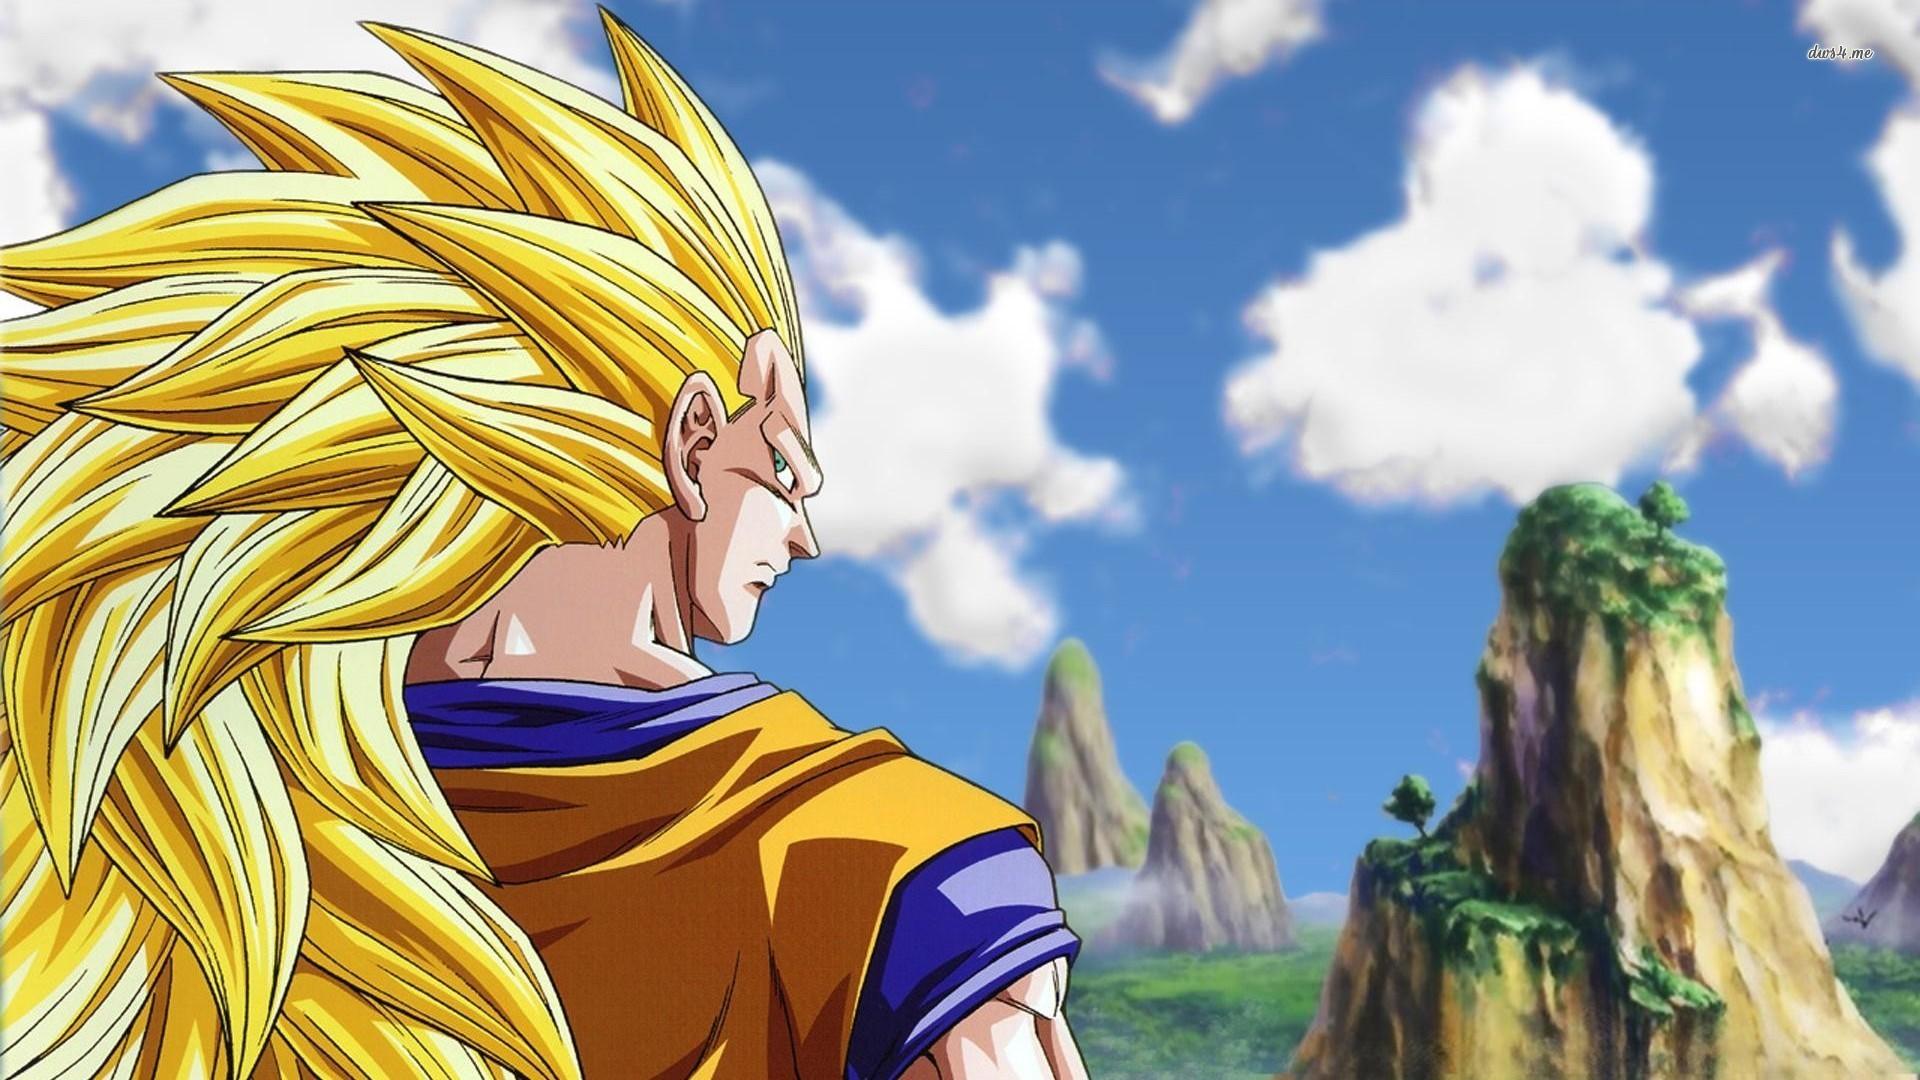 High Resolution Best Anime Dragon Ball Z Wallpaper HD 13 Full Size .